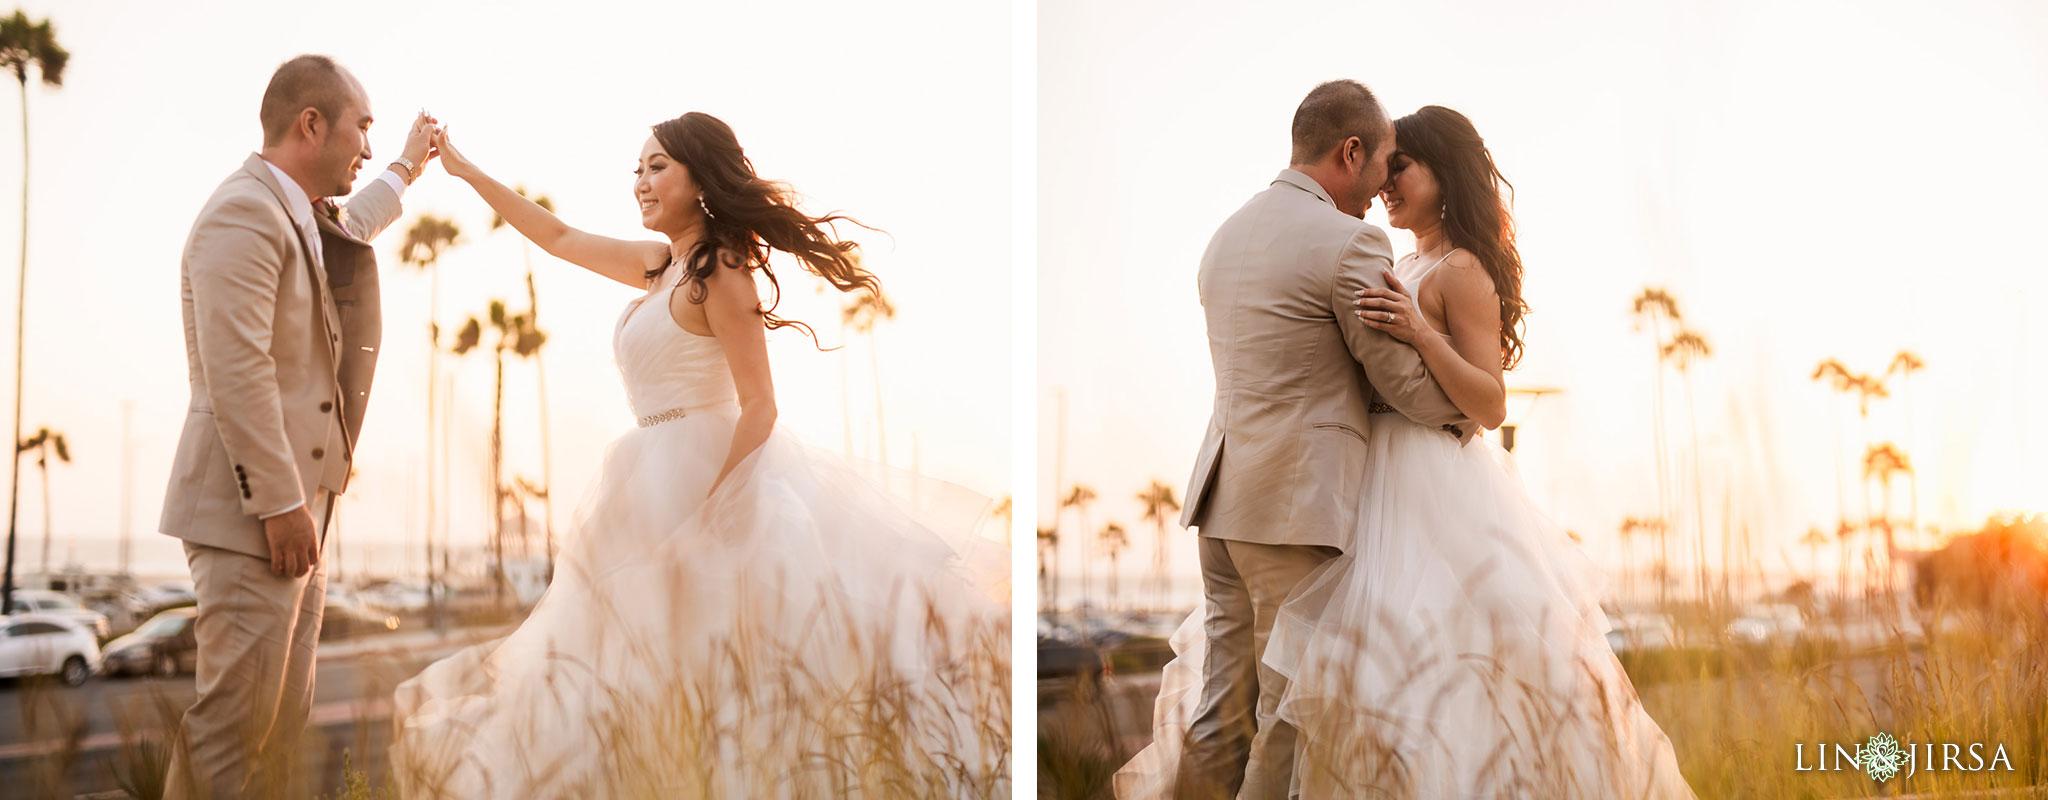 023 pasea hotel huntington beach wedding photography